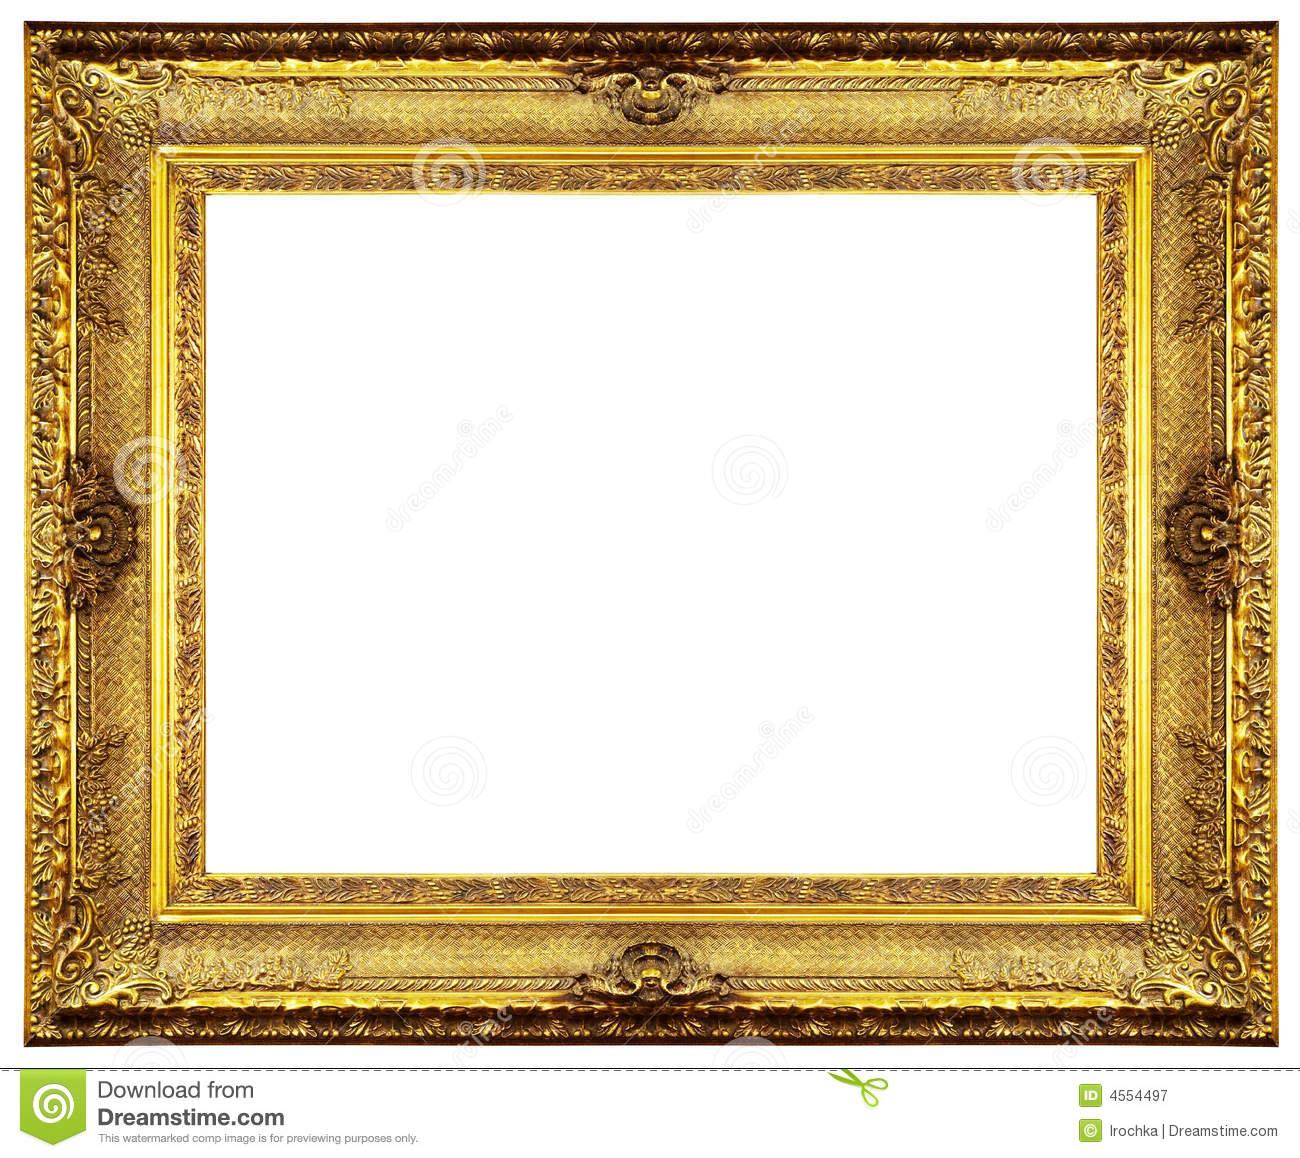 Gold Frame Border Clip Art | Chipped vin-Gold Frame Border Clip Art | Chipped vintage gold ornate frame. Isolated on white.-18